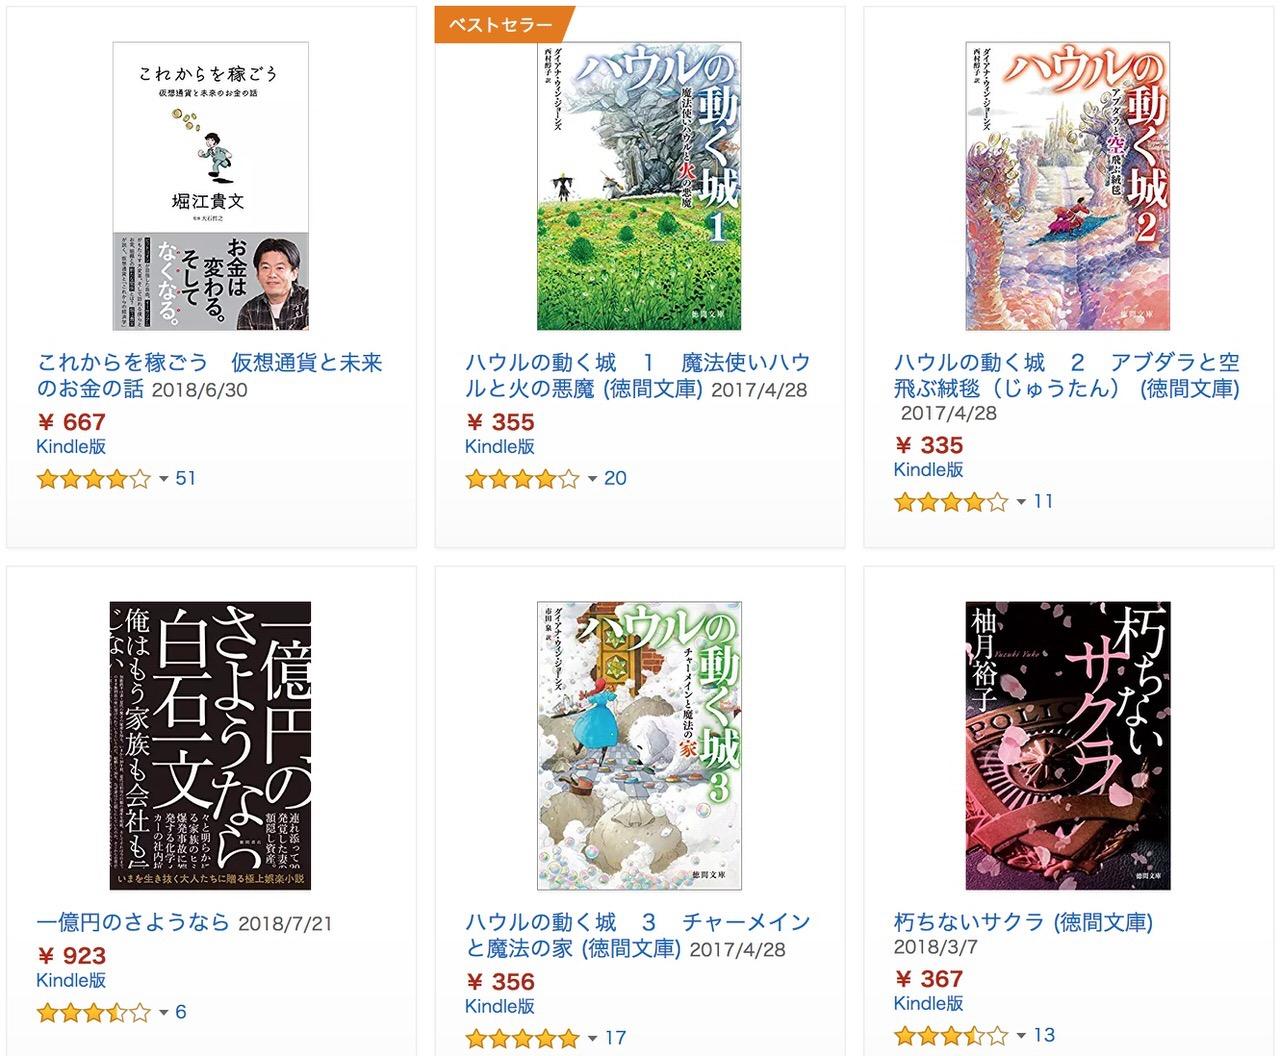 【Kindleセール】1,300冊以上が対象「徳間書店 書籍50%OFFセール」(9/13まで)